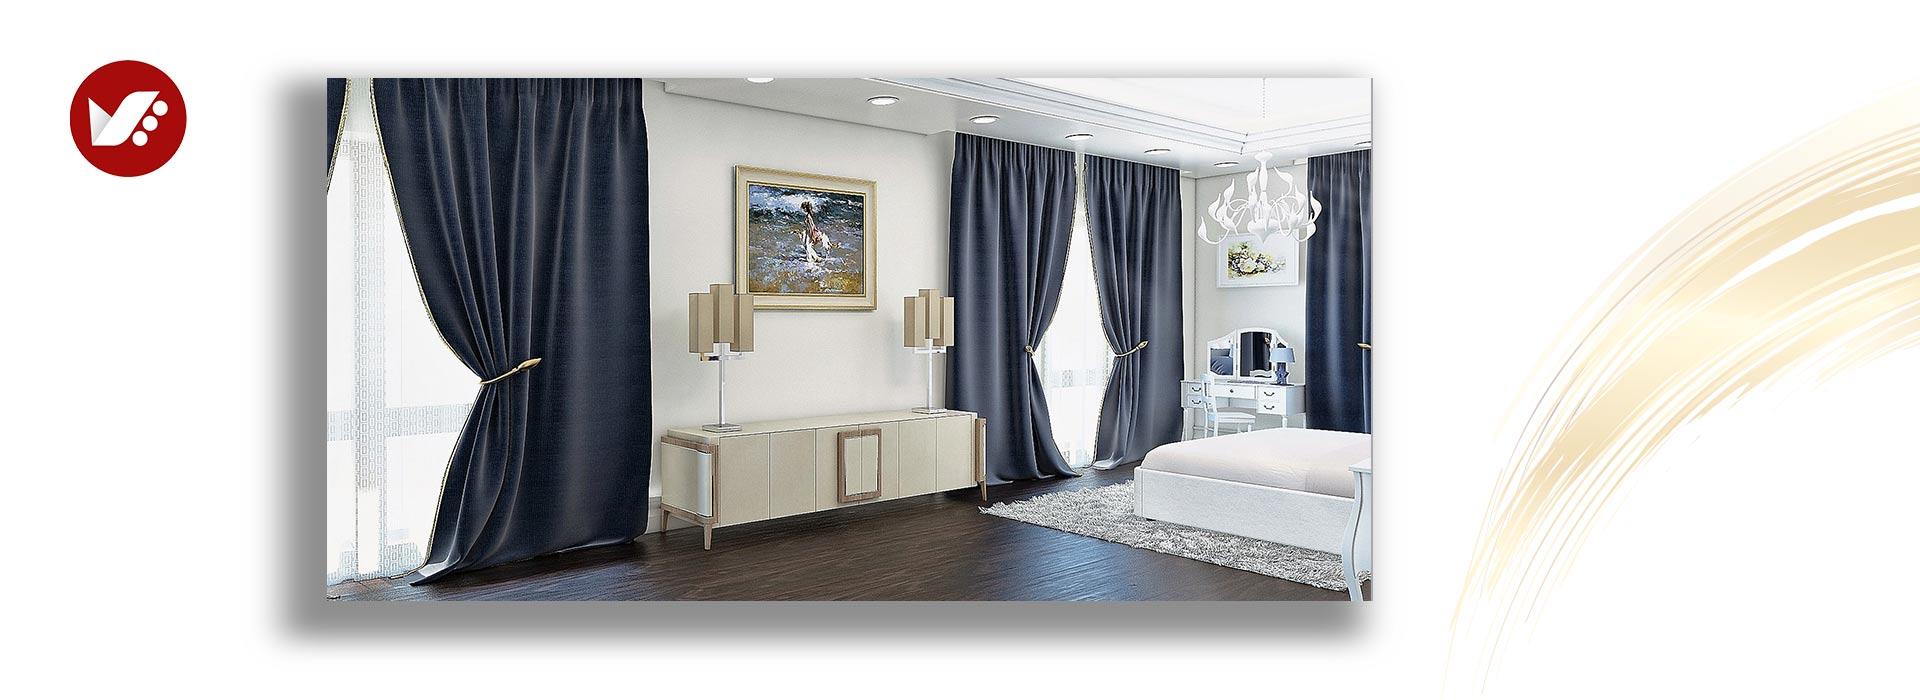 bedroom makeover curtains - تغییر دکوراسیون اتاق خواب